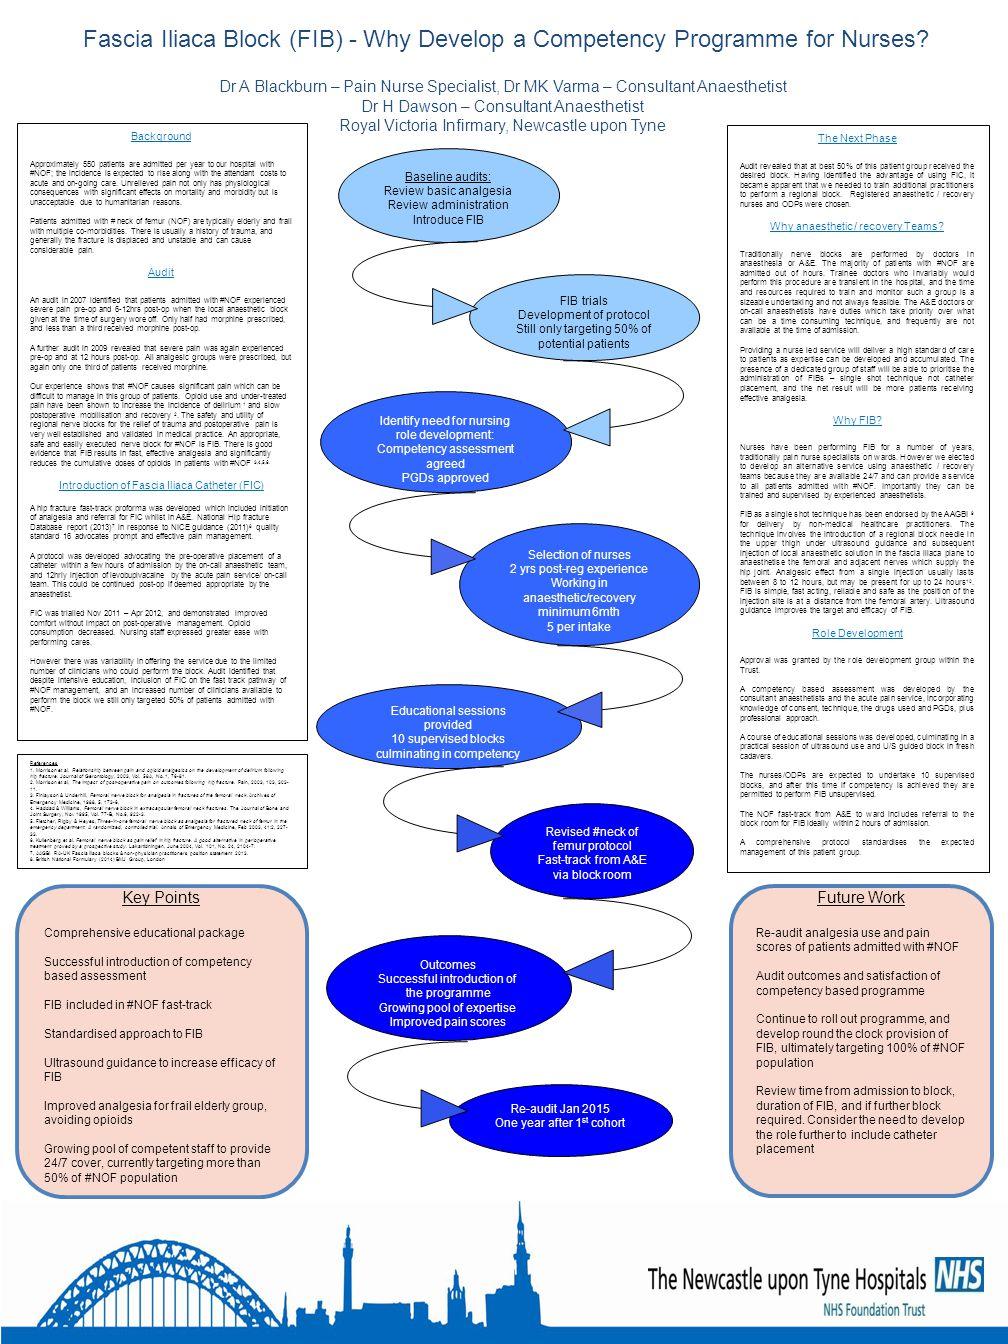 Fascia Iliaca Block (FIB) - Why Develop a Competency Programme for Nurses